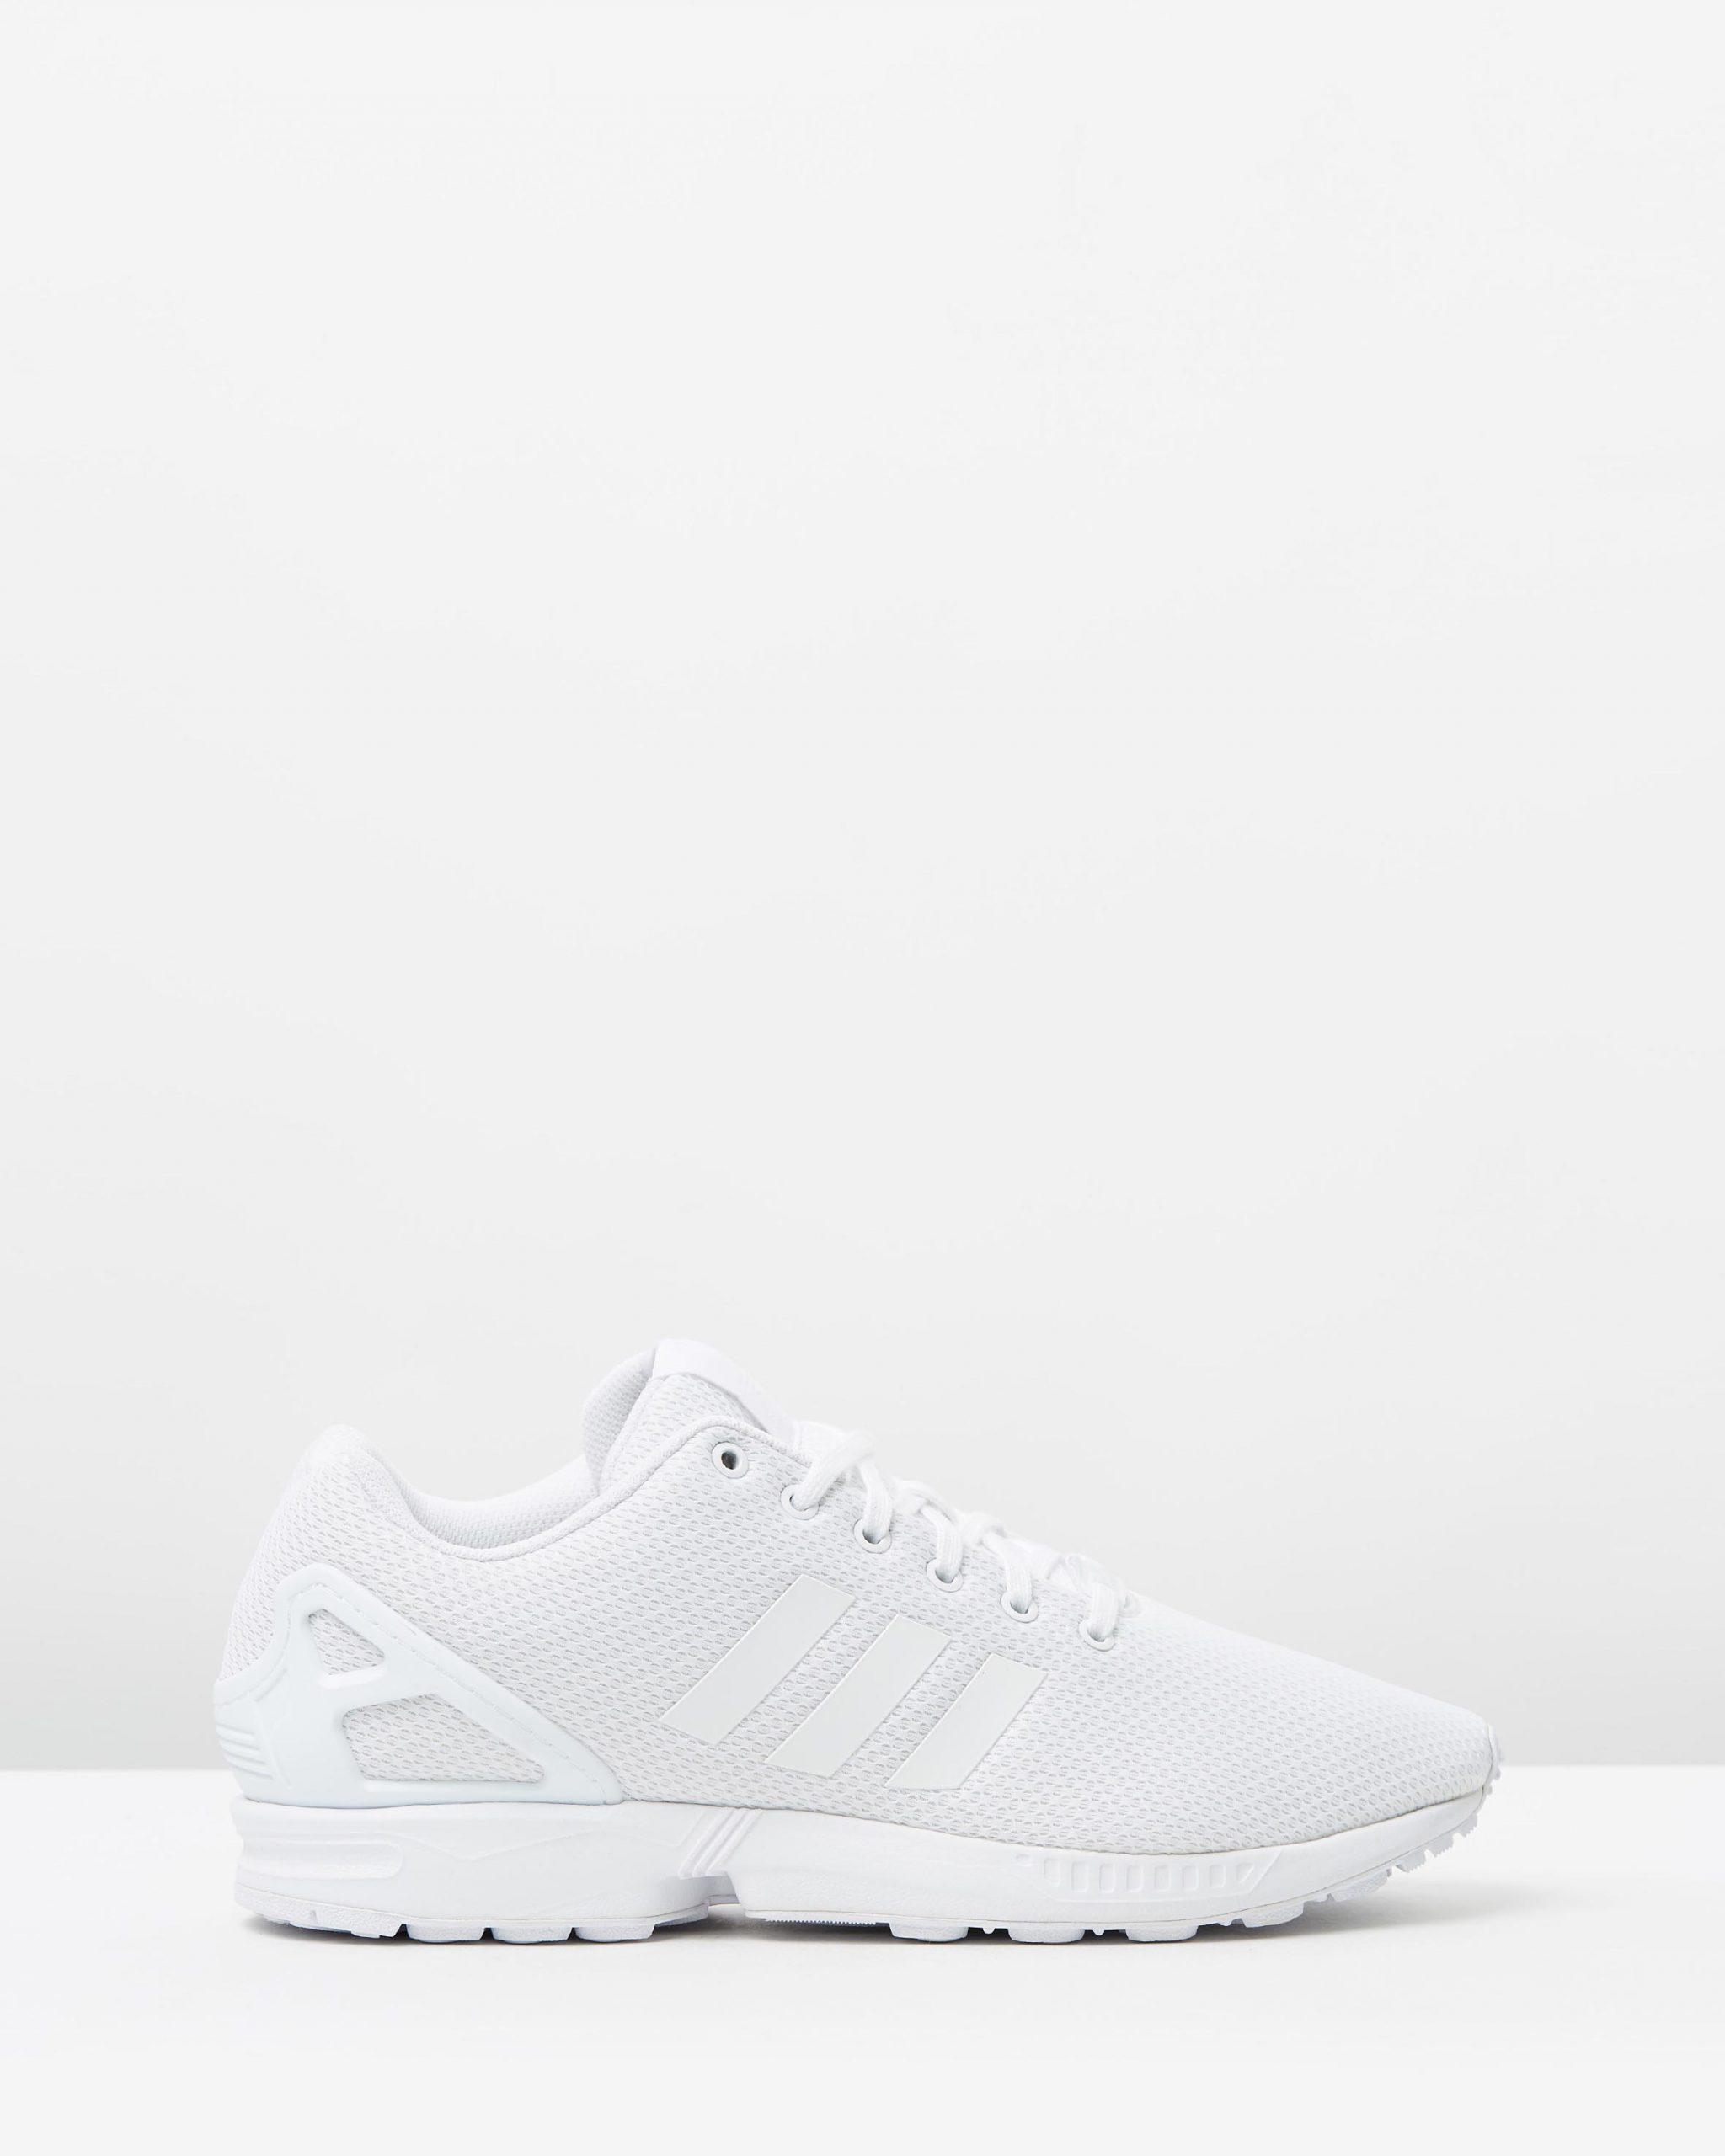 Adidas Women's ZX Flux FTWR White